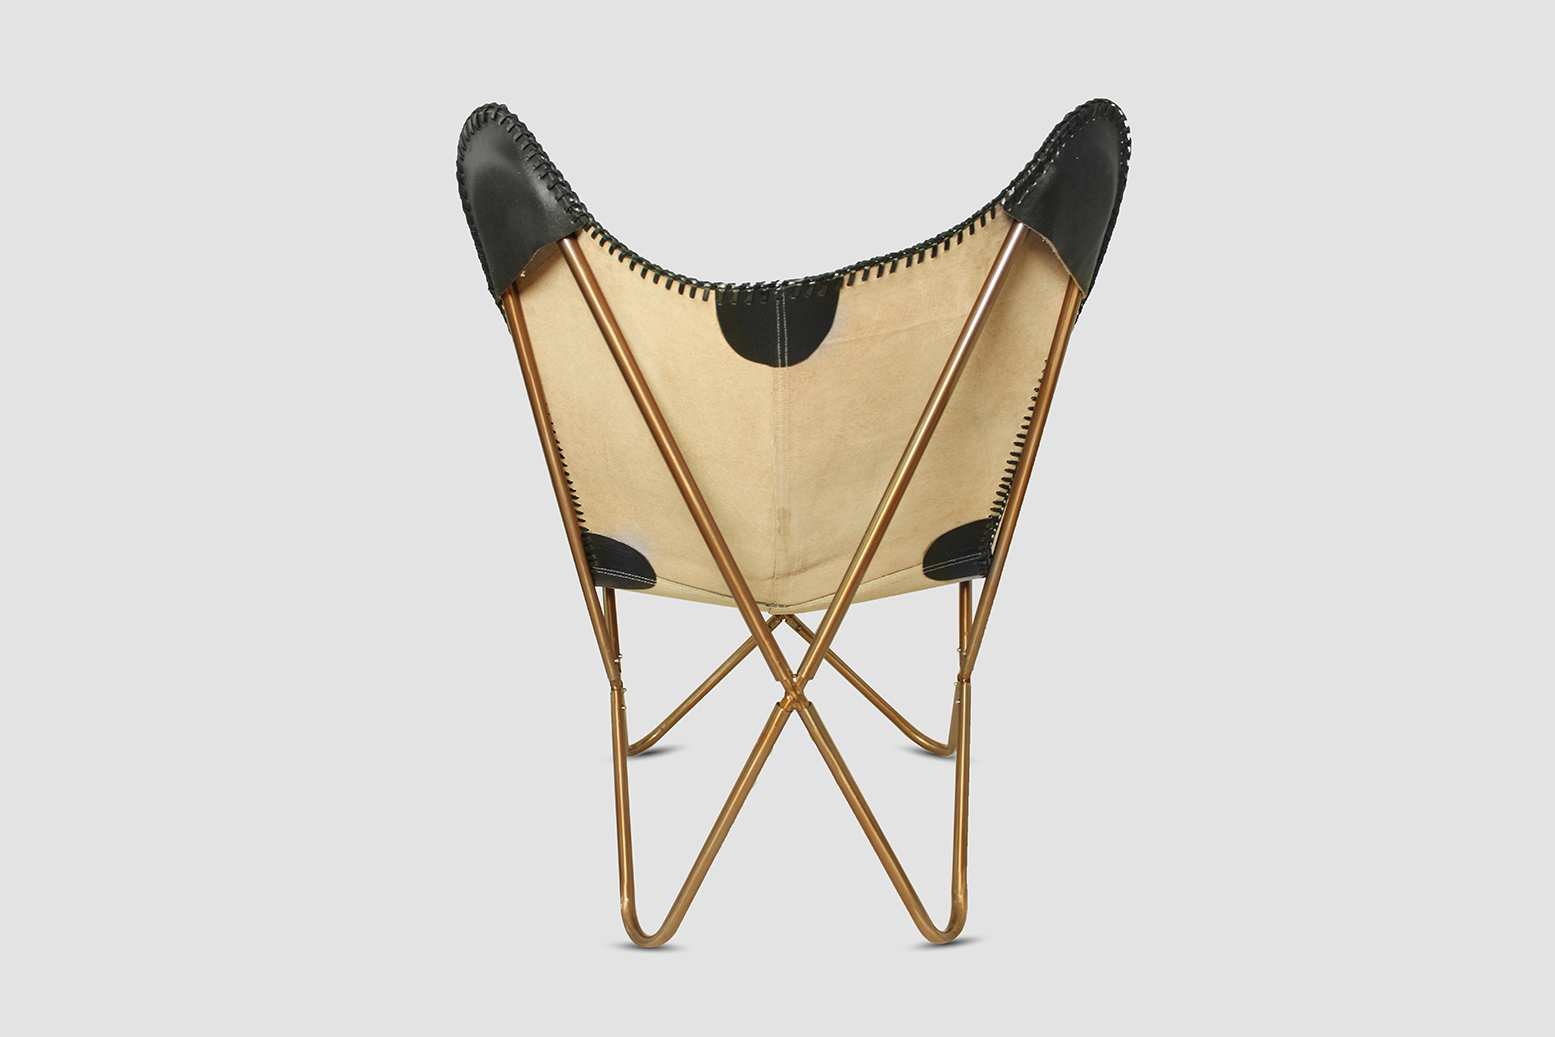 butterfly chair echtleder vintage relaxsessel schmetterling stuhl hardoy schwarz ebay. Black Bedroom Furniture Sets. Home Design Ideas